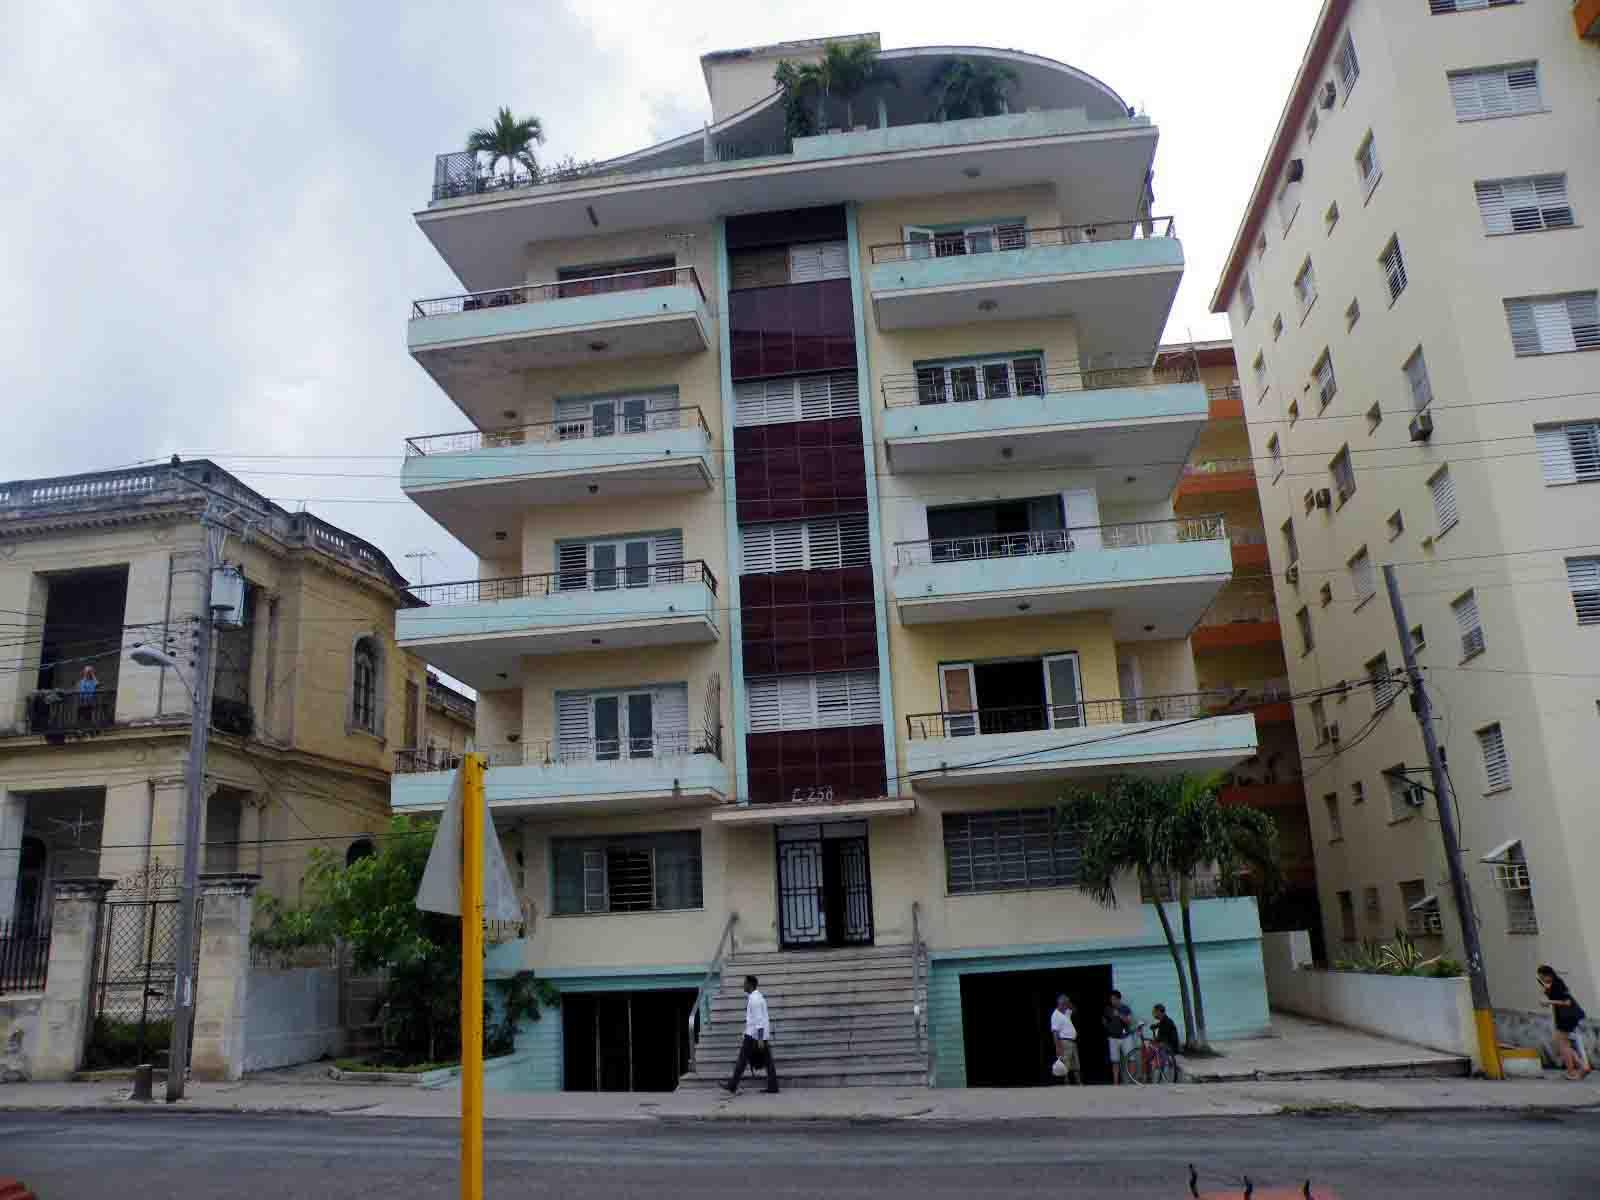 HAV302 - Penthouse Mirta